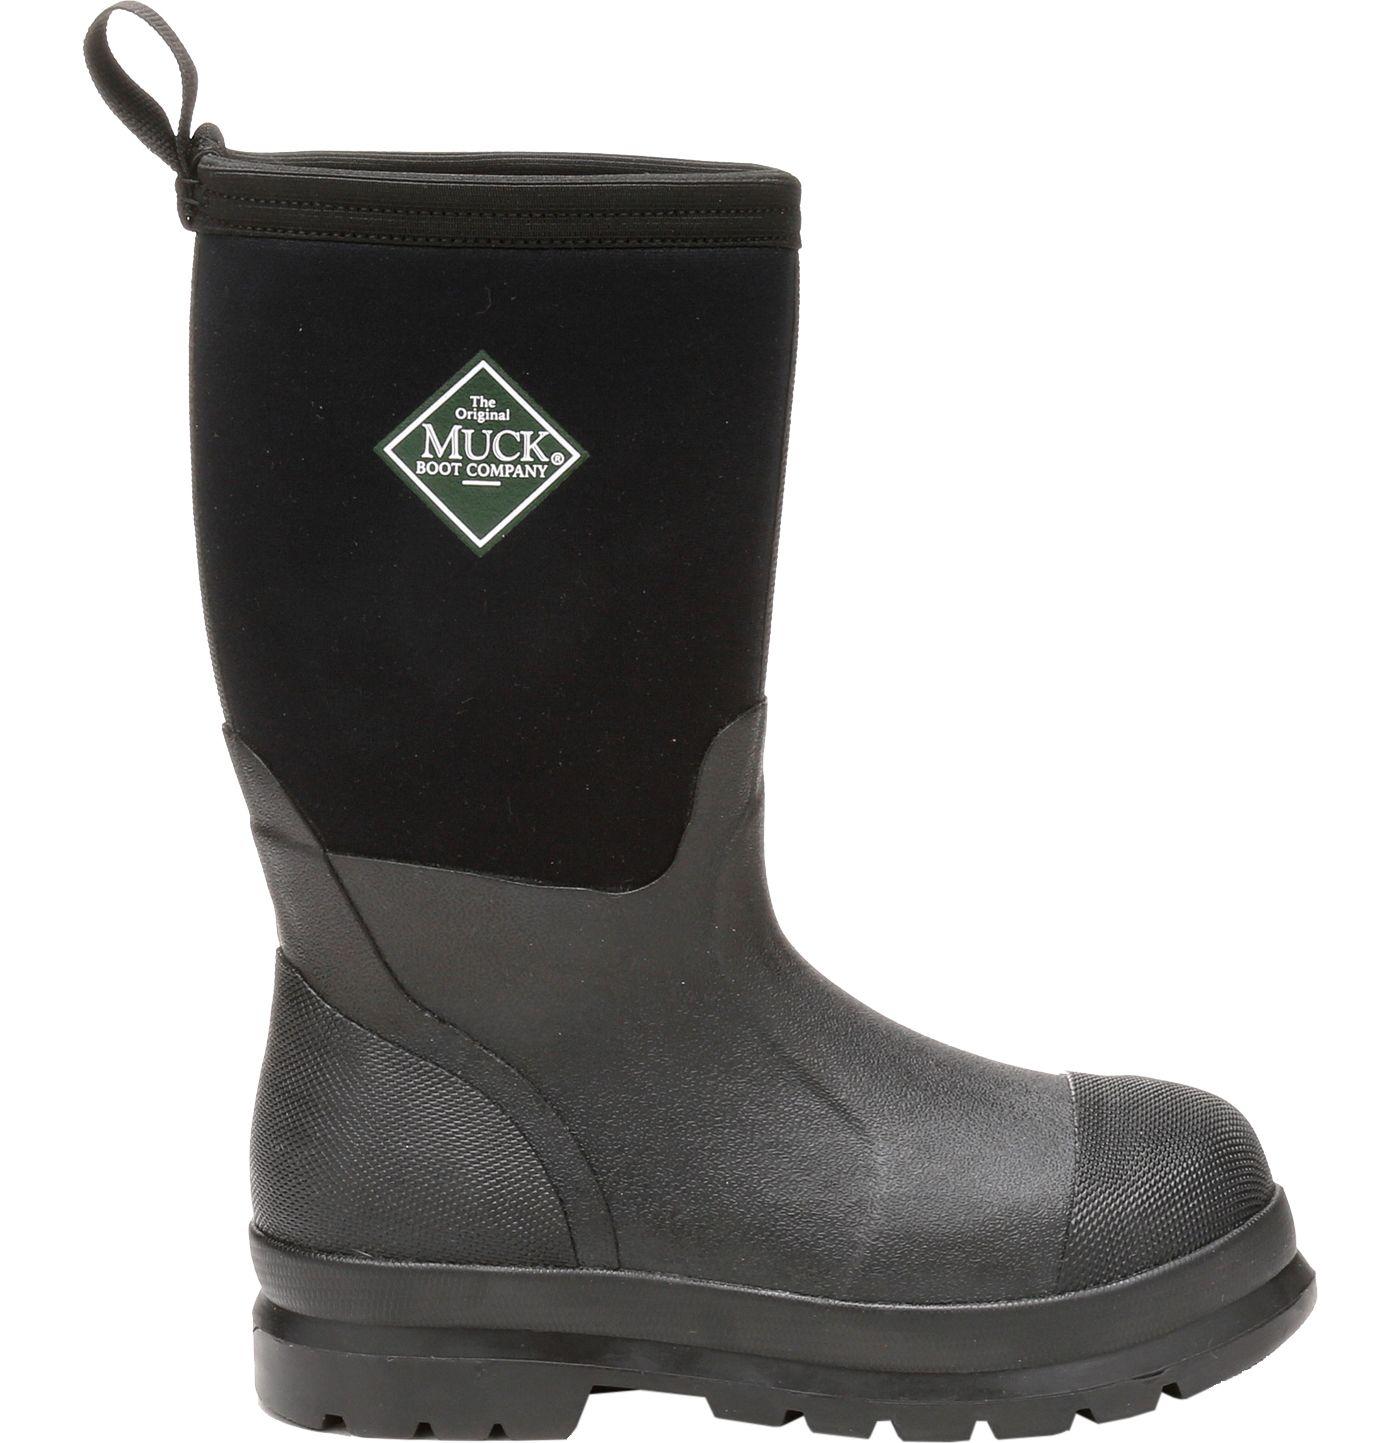 Muck Boots Kids' Chore Insulated Waterproof Work Boots